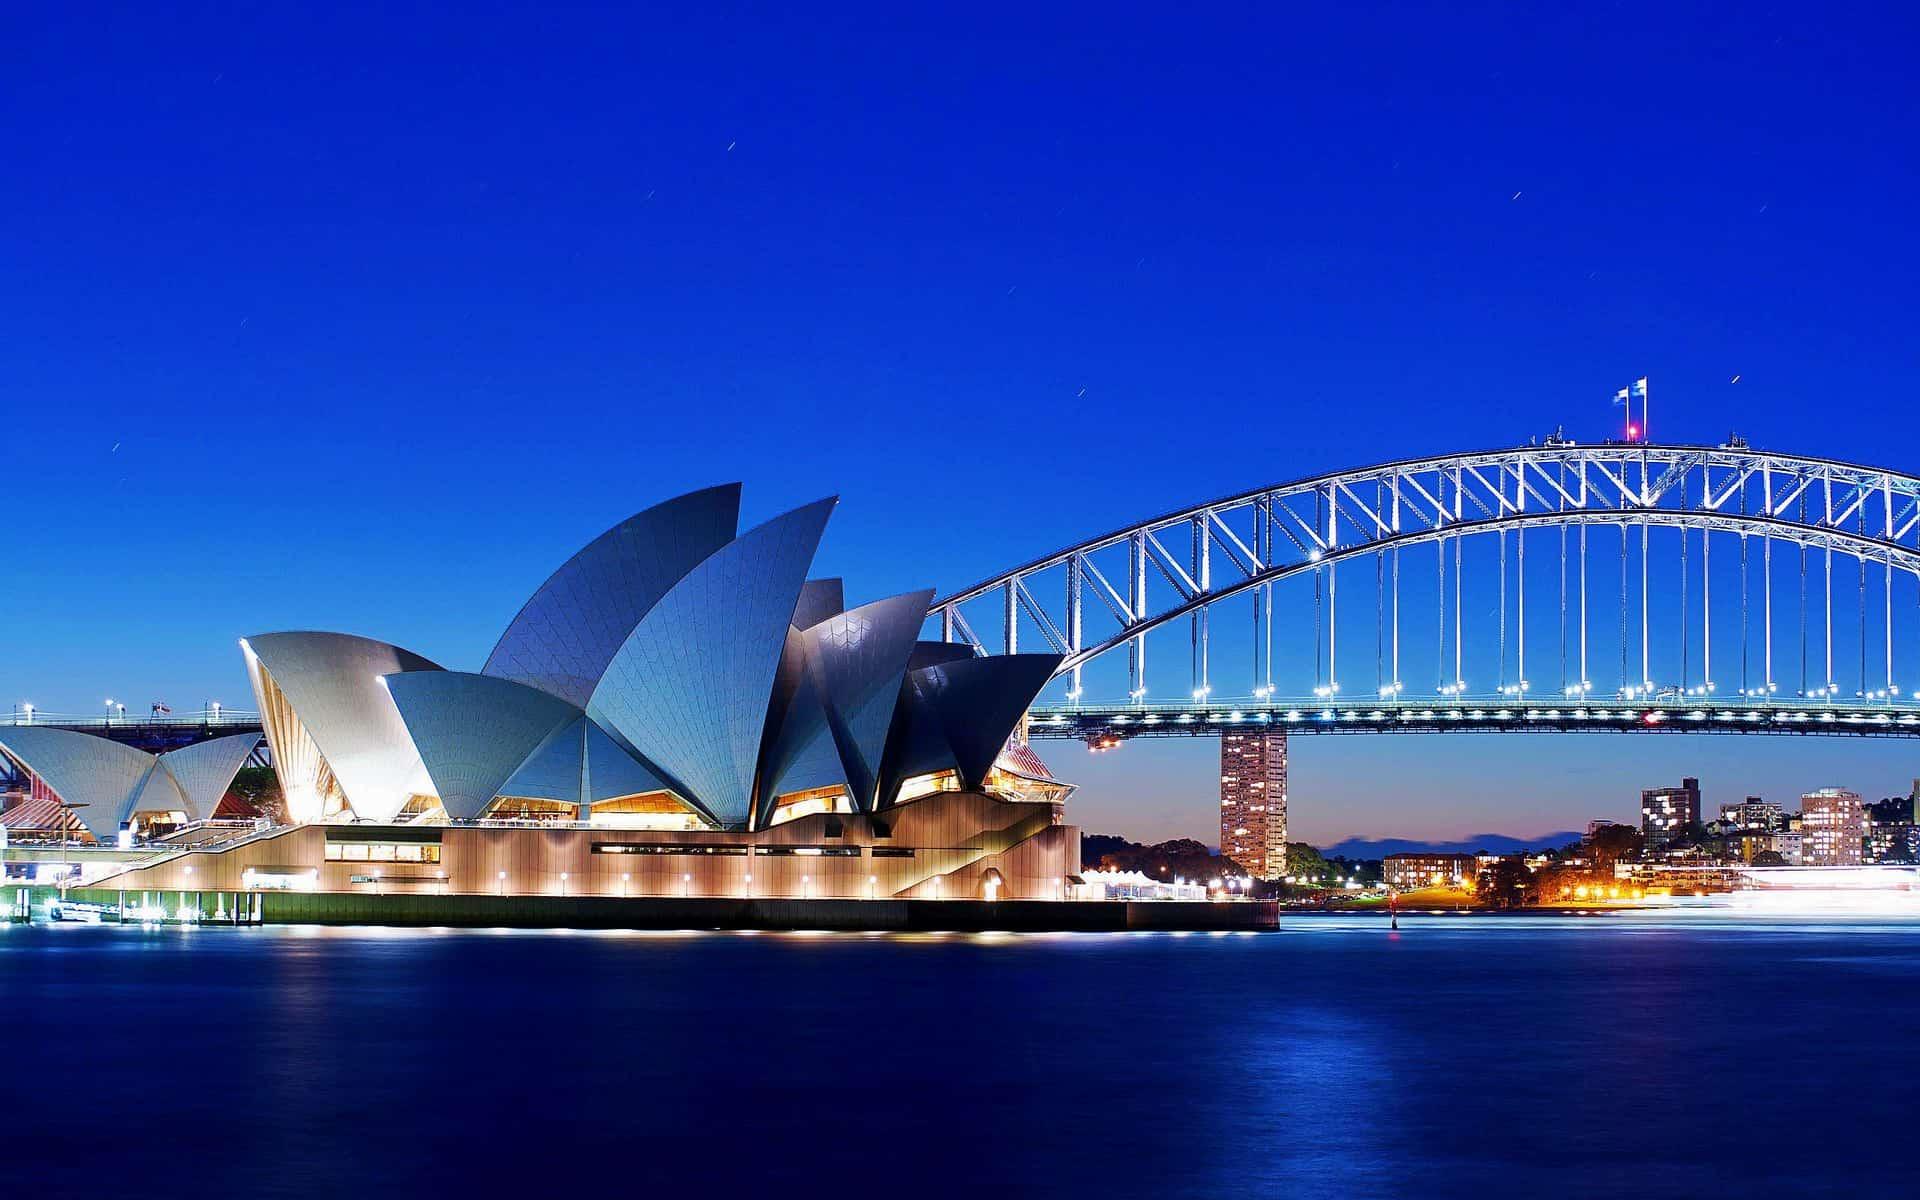 Visiting The Sydney Opera House